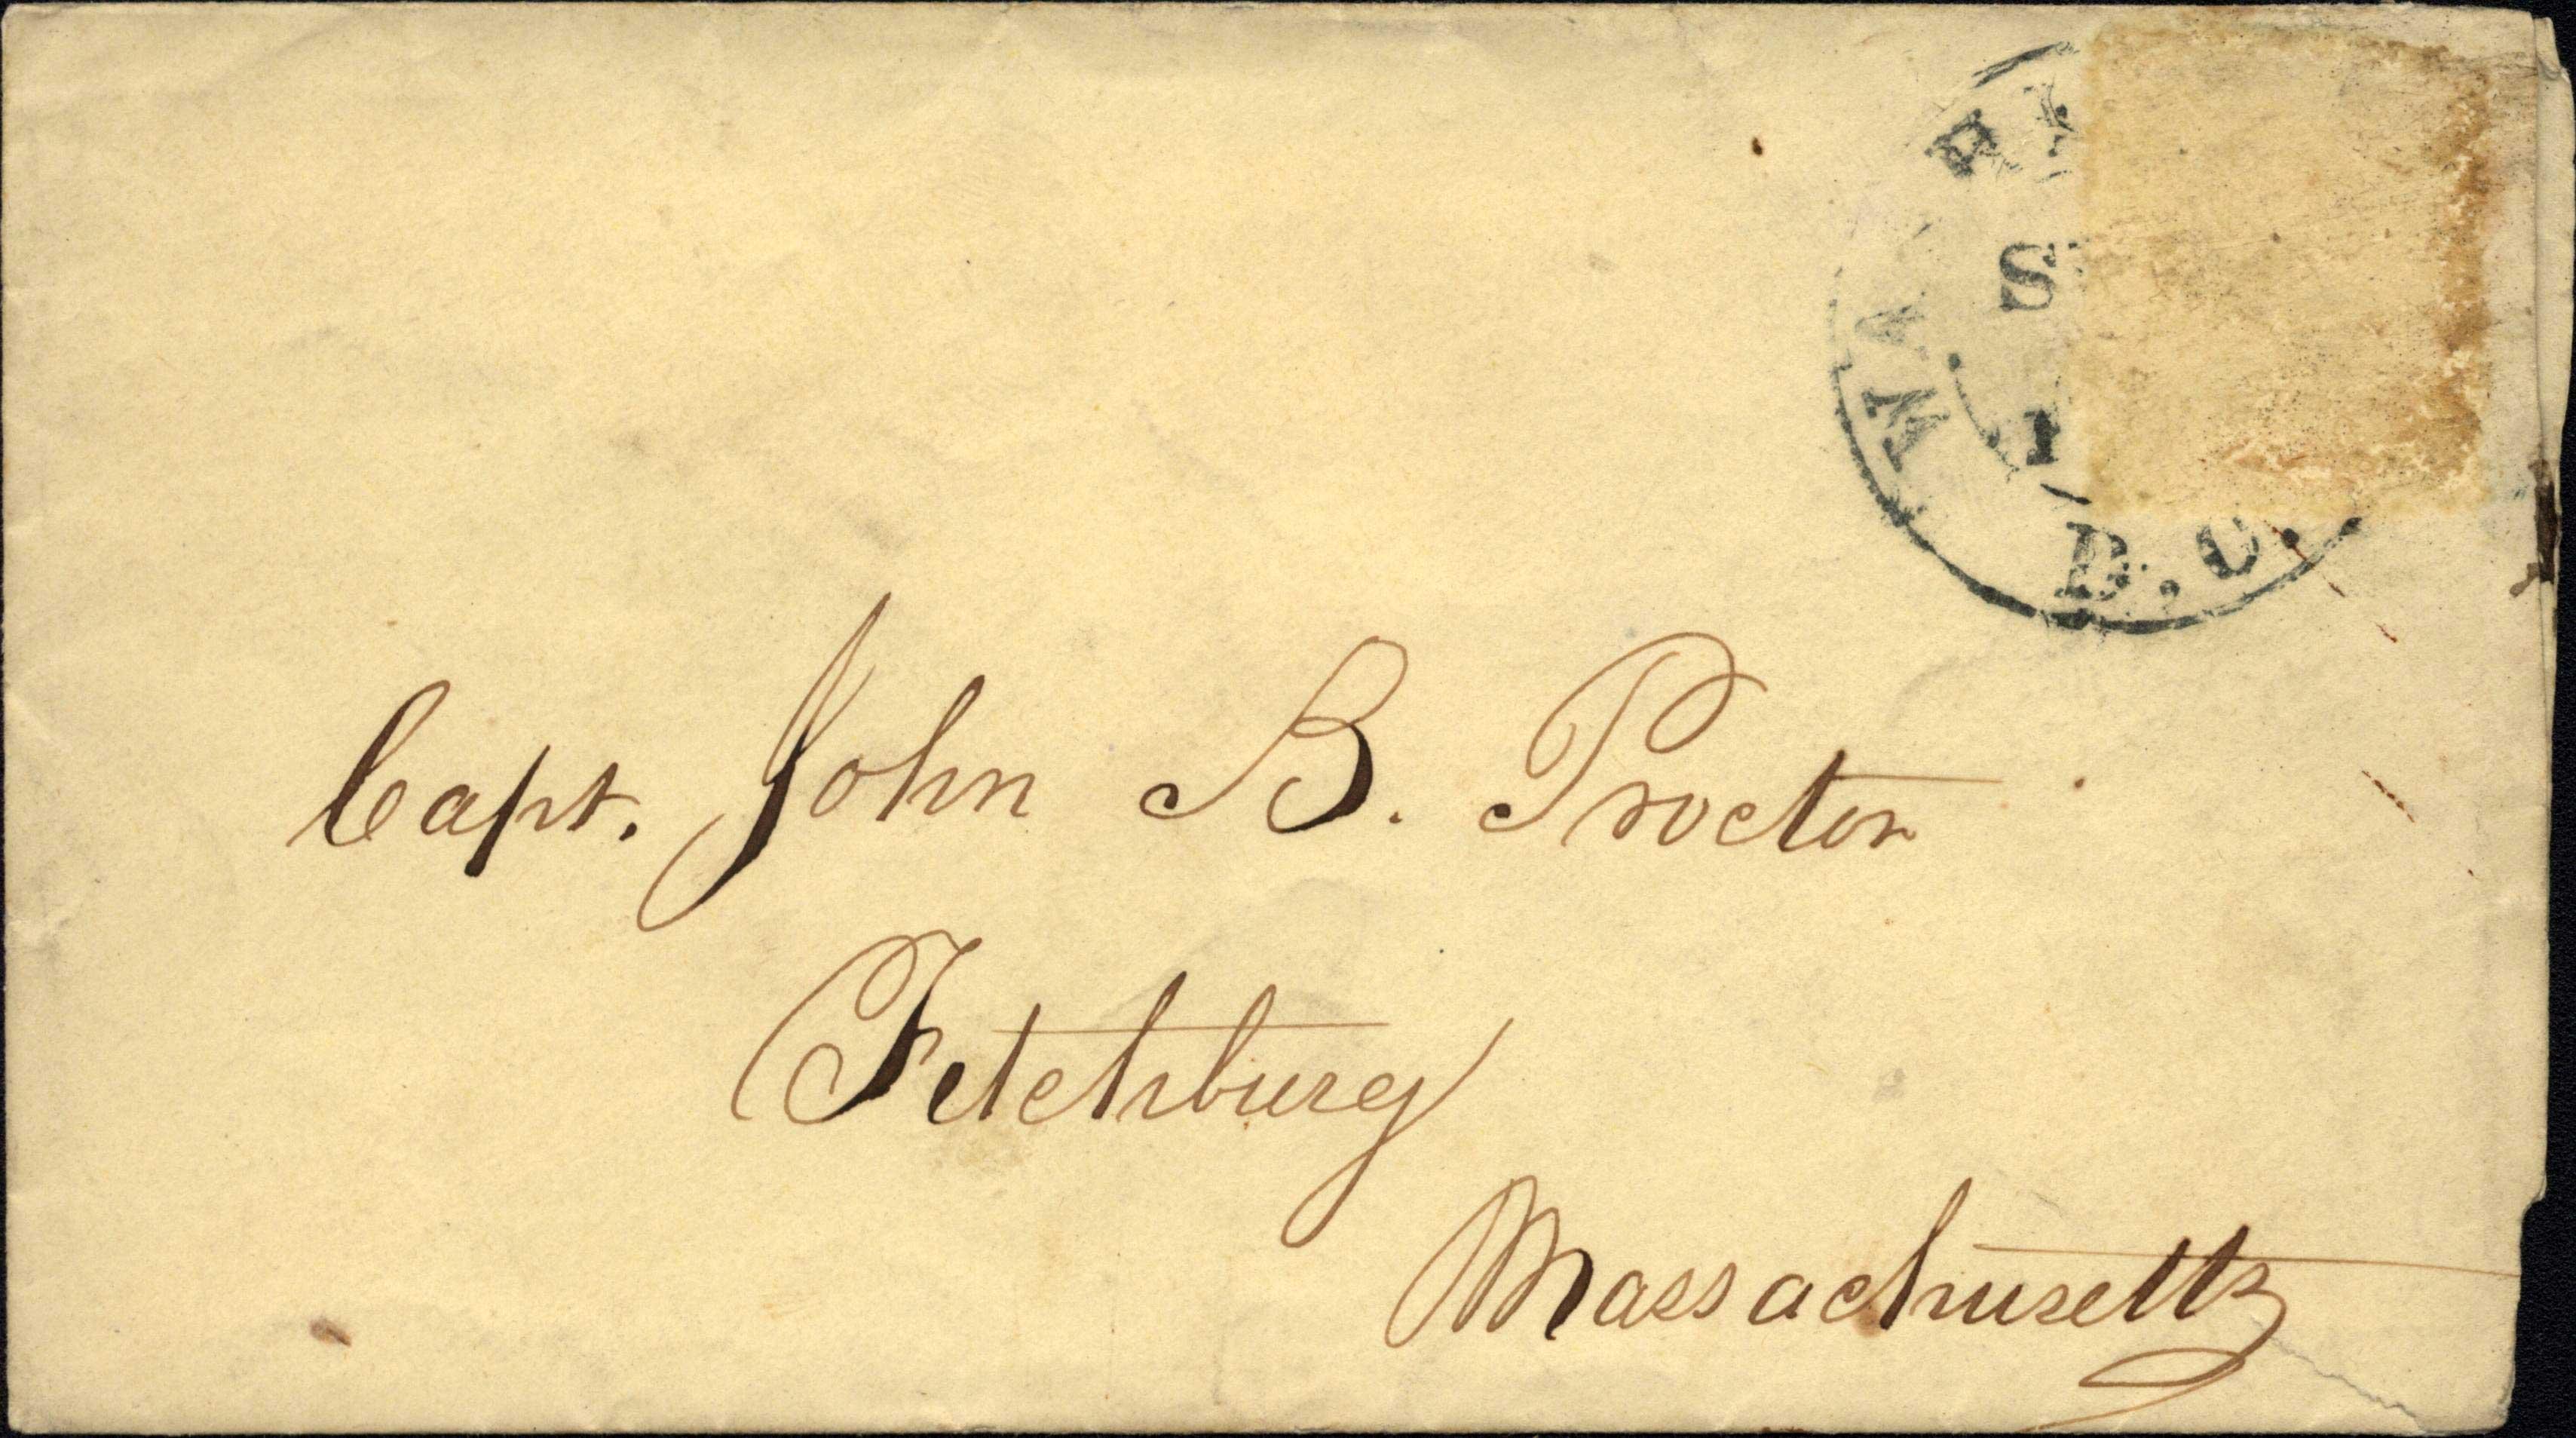 Envelope addressed to J.B.Proctor